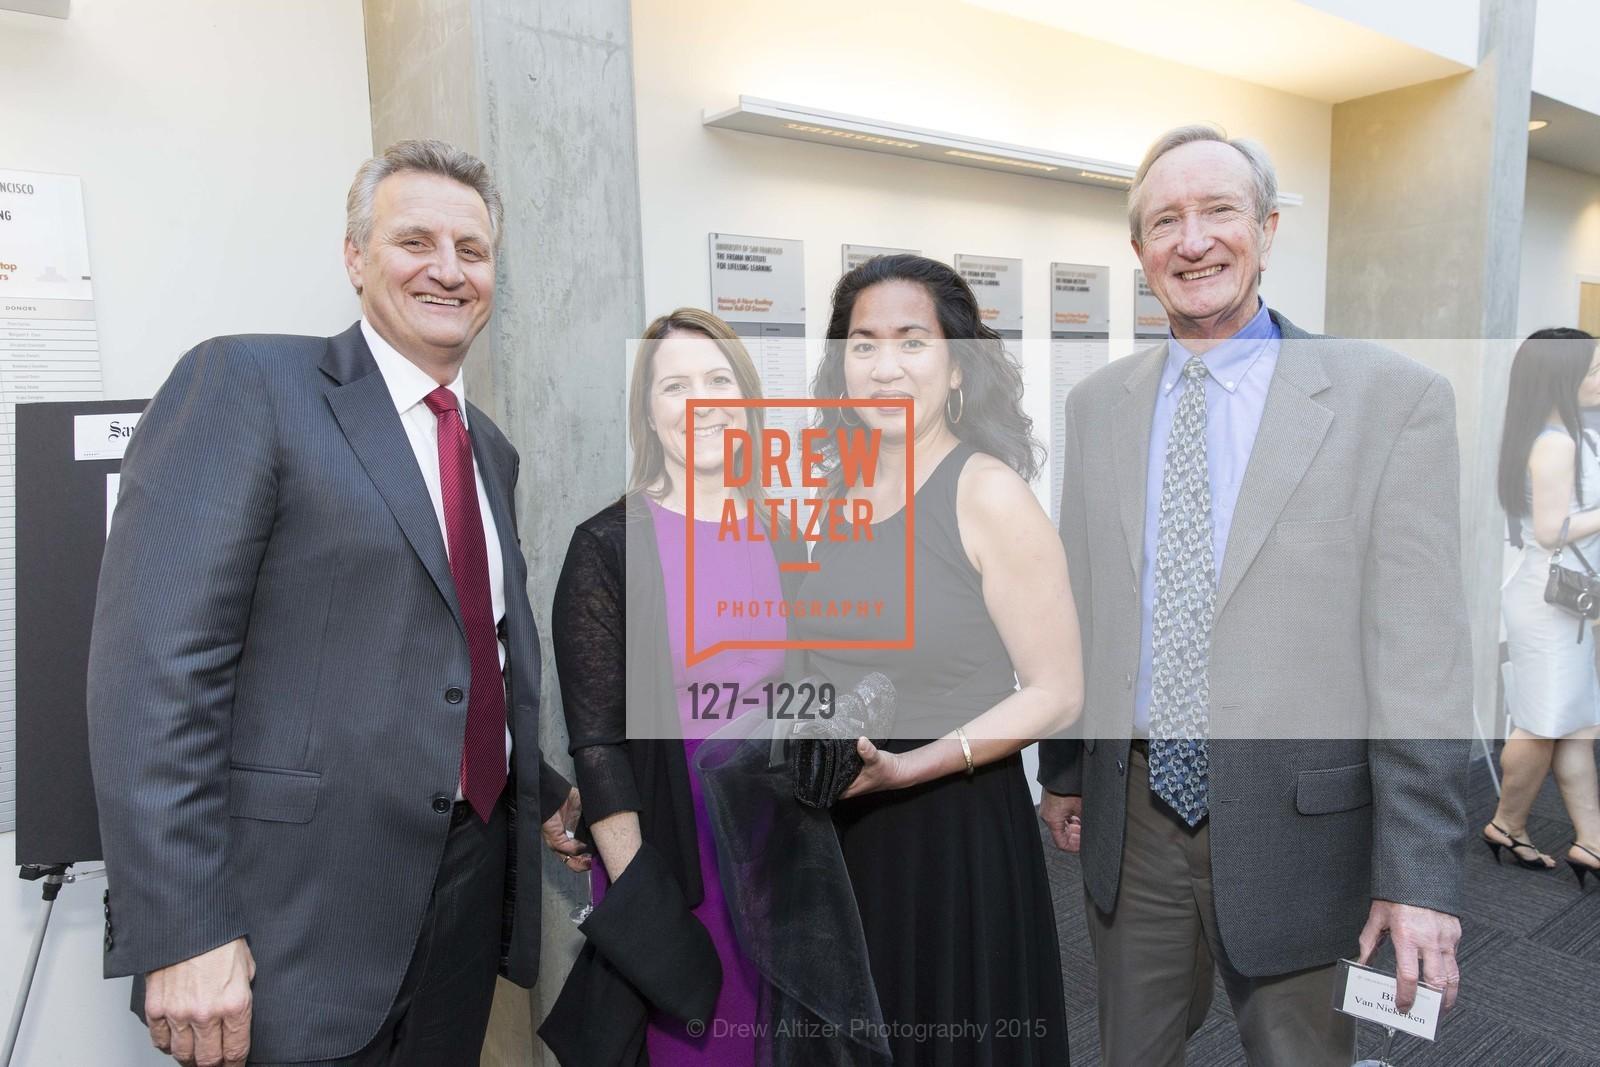 Jeff Johnson, Jennifer Kirschbaum, Kay Phan, Bill van Niekerken, Photo #127-1229